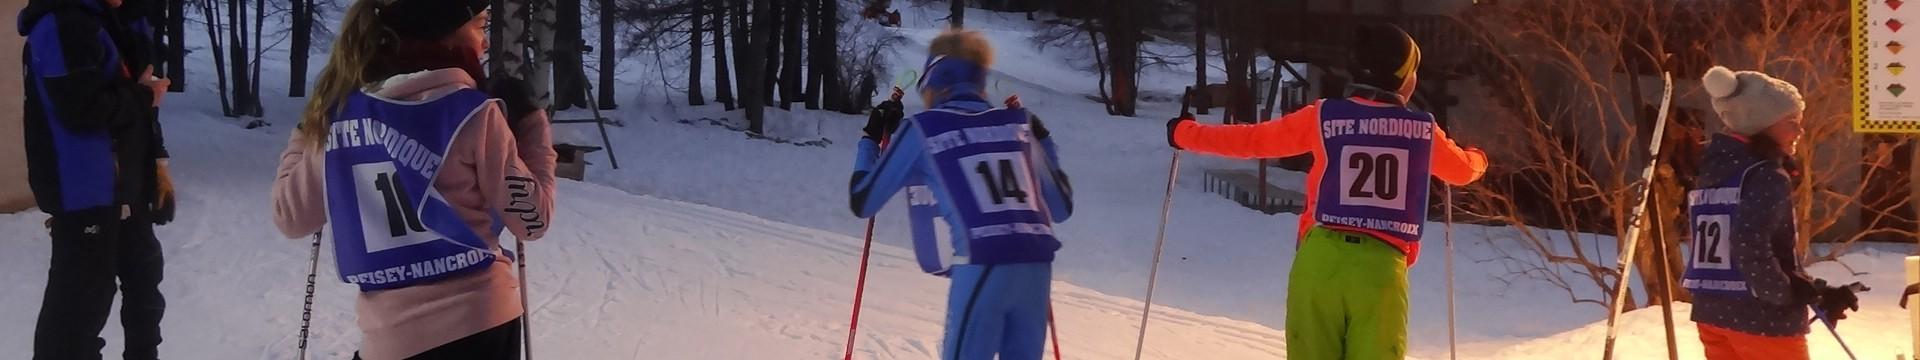 ski-and-run-01-9008